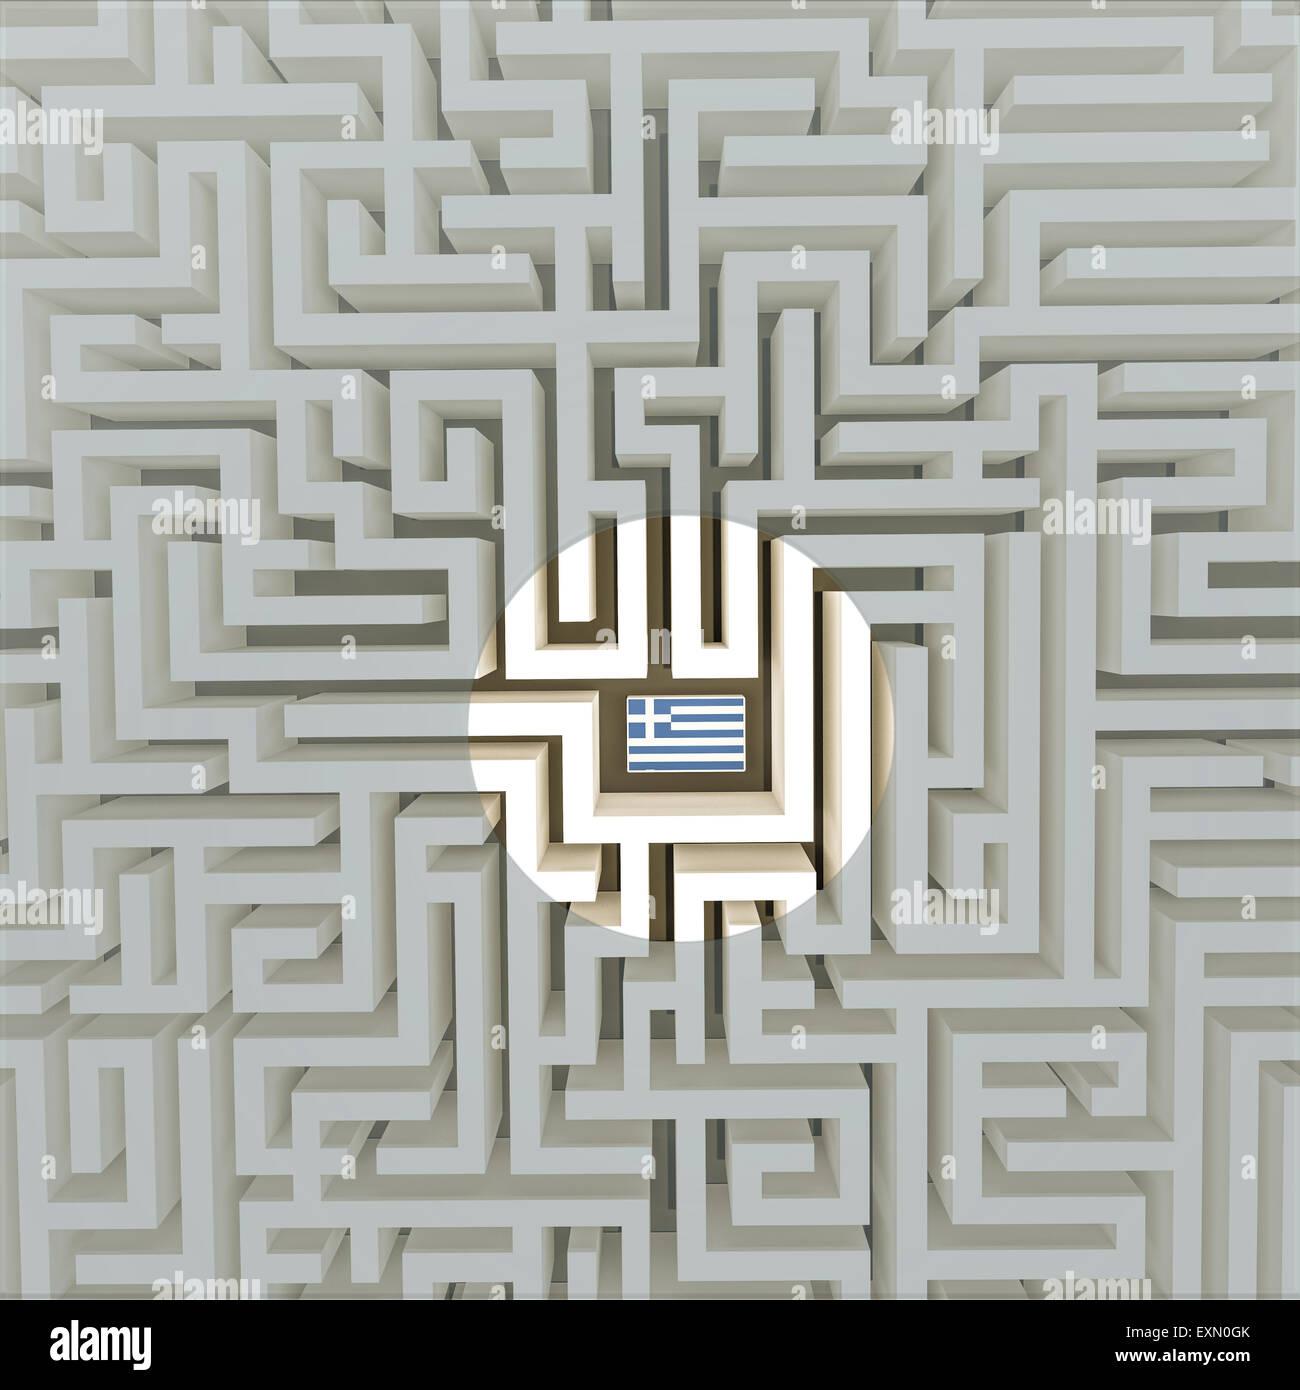 Greek flag in a maze Stock Photo